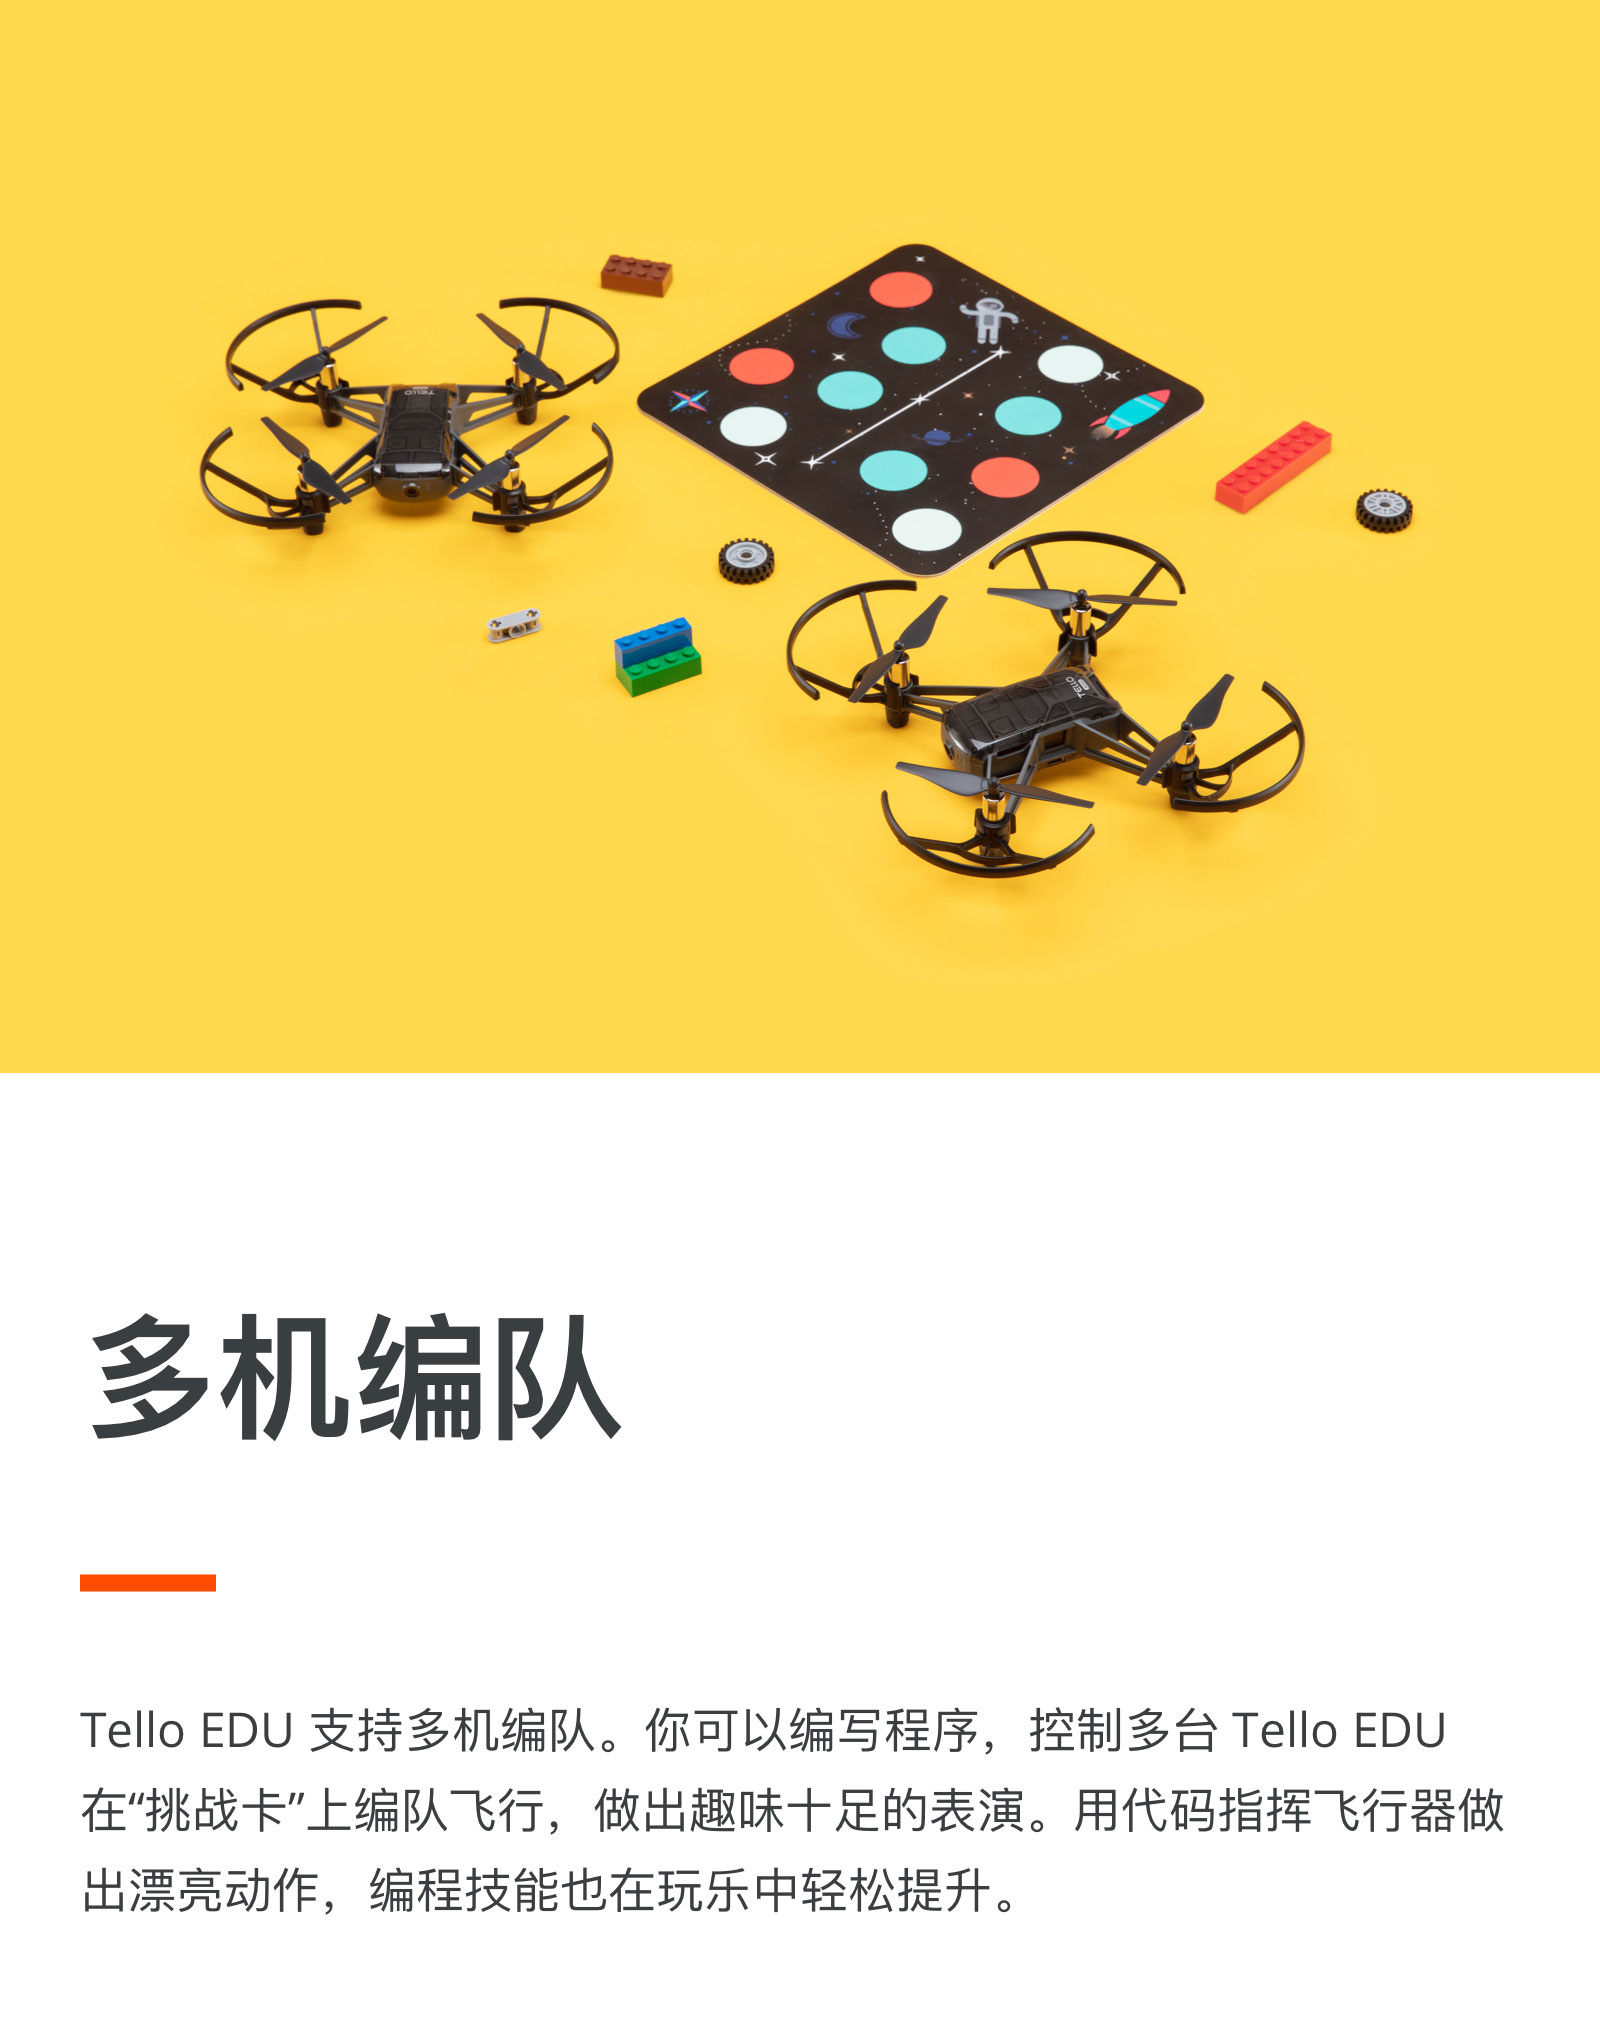 tello-edu-cn-m800-copy_03.jpg